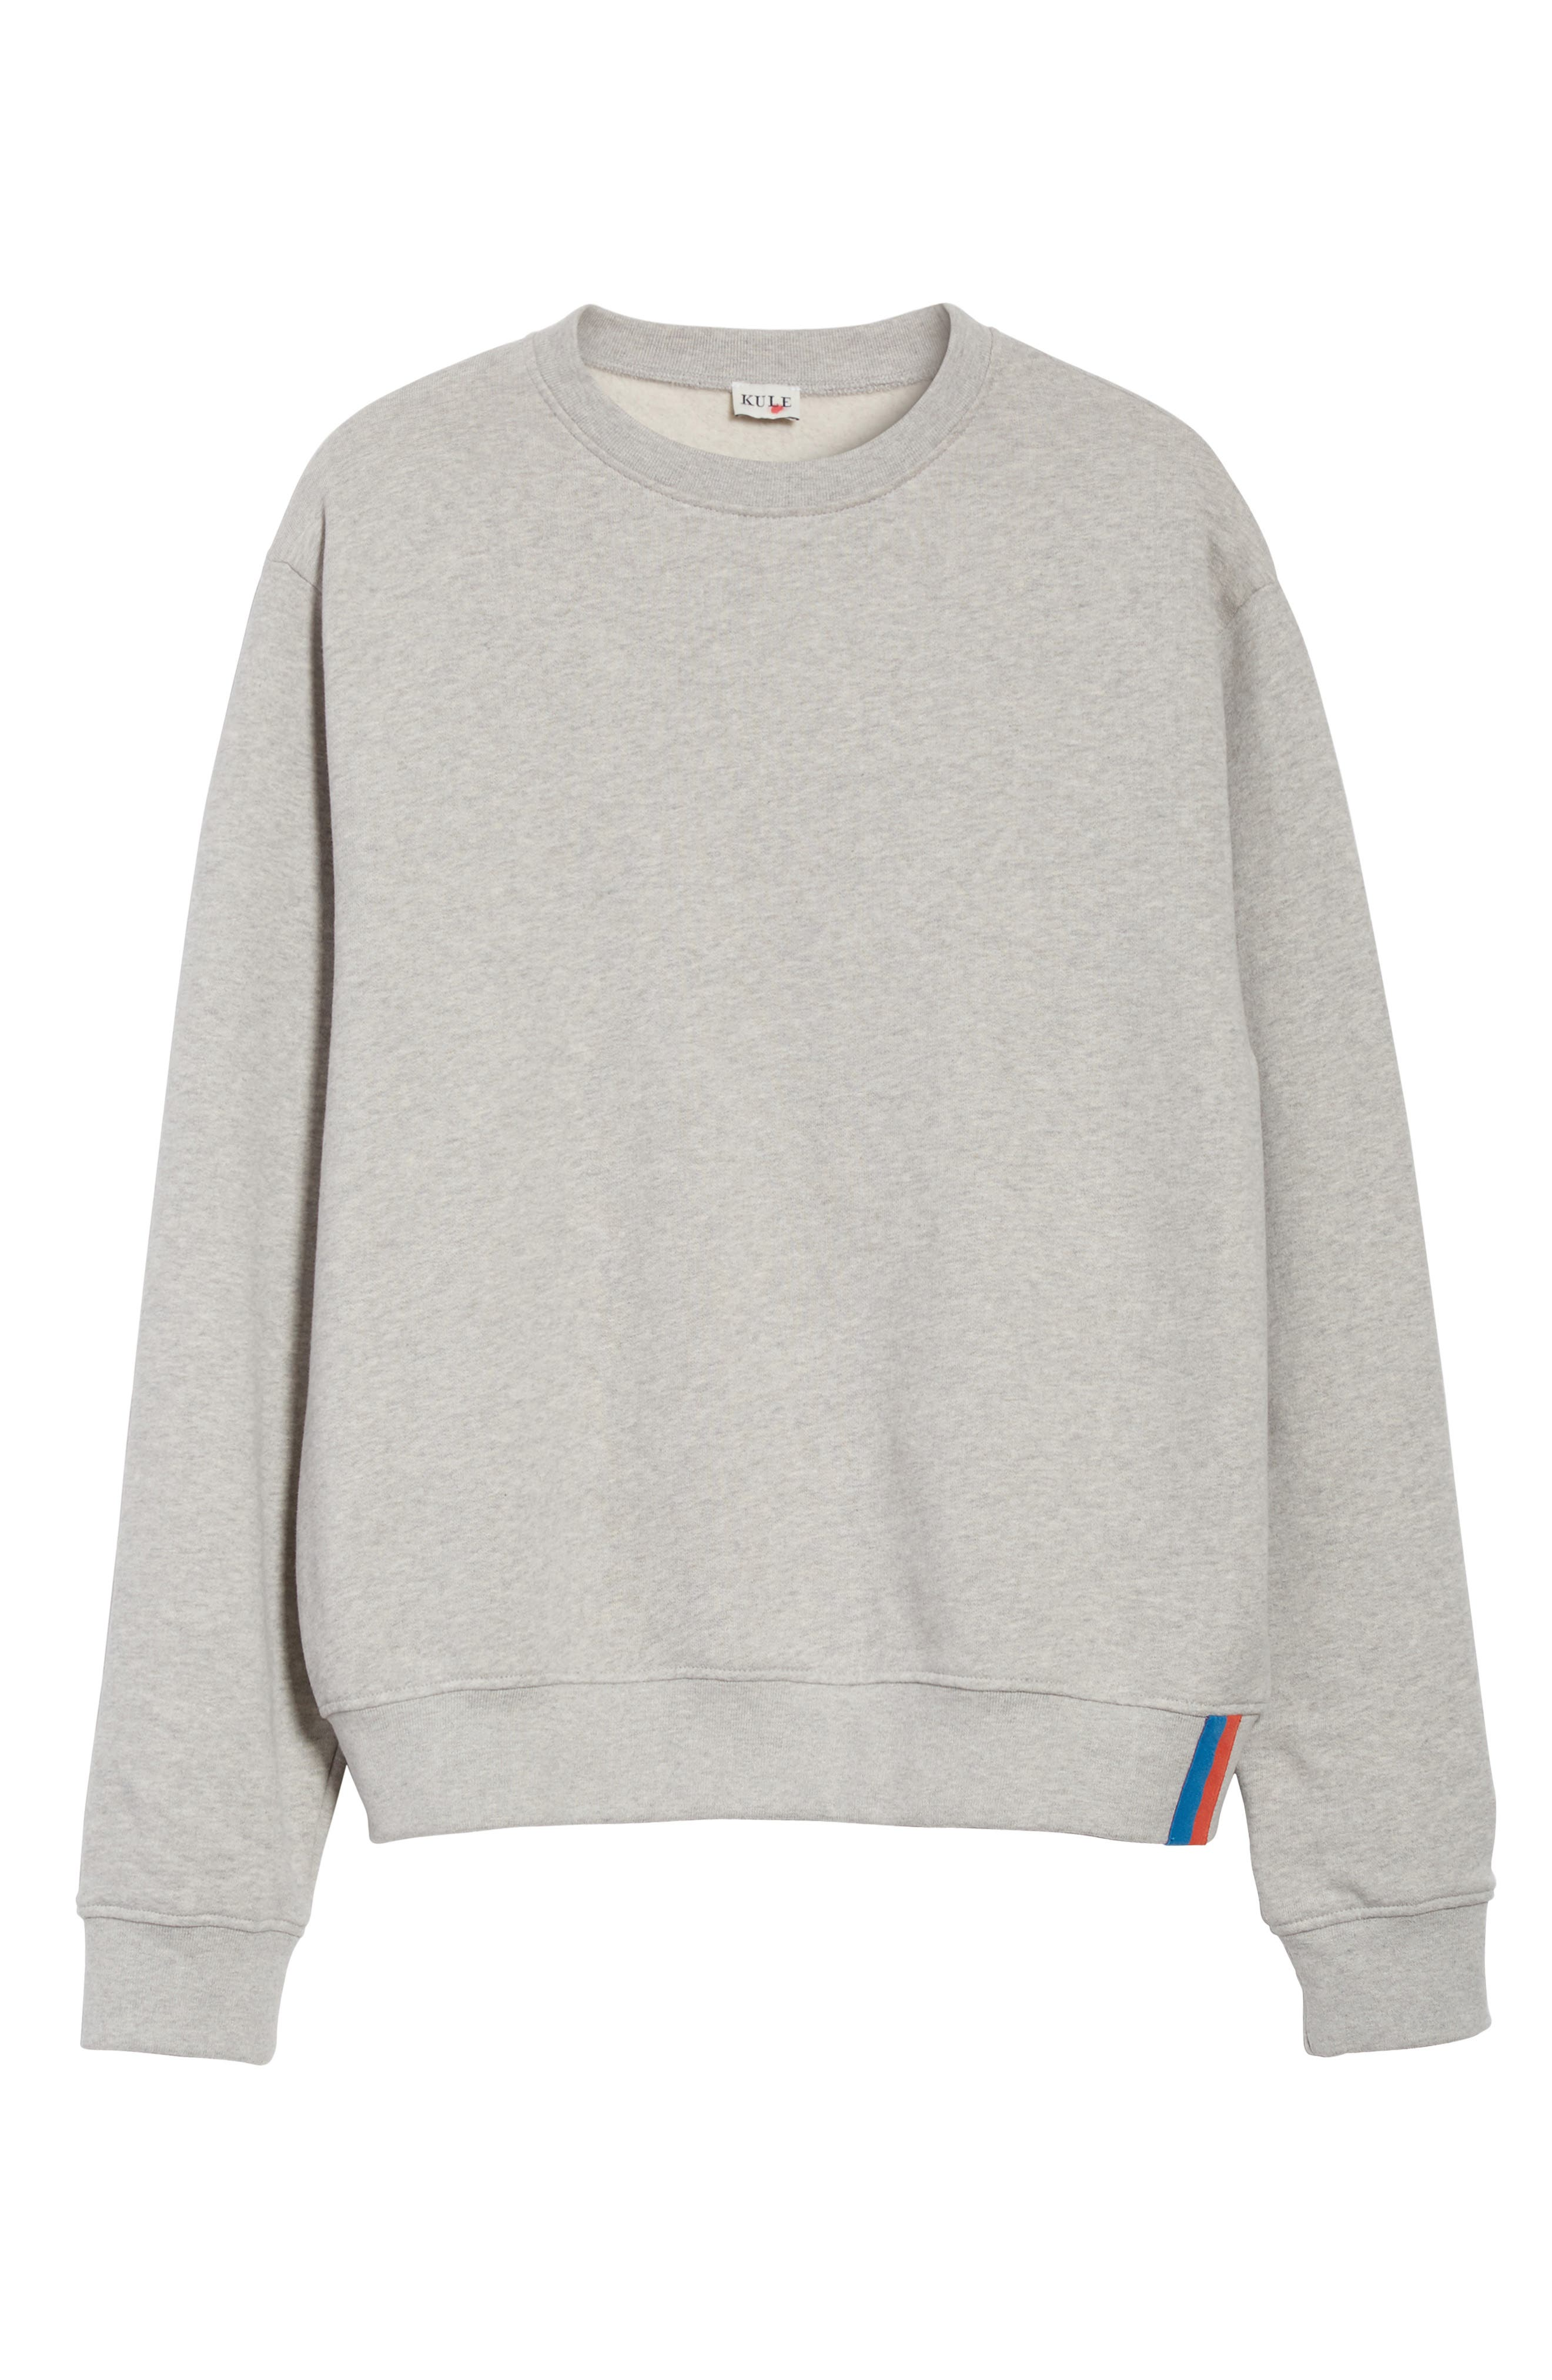 Cotton Sweatshirt,                             Alternate thumbnail 6, color,                             HEATHER GREY